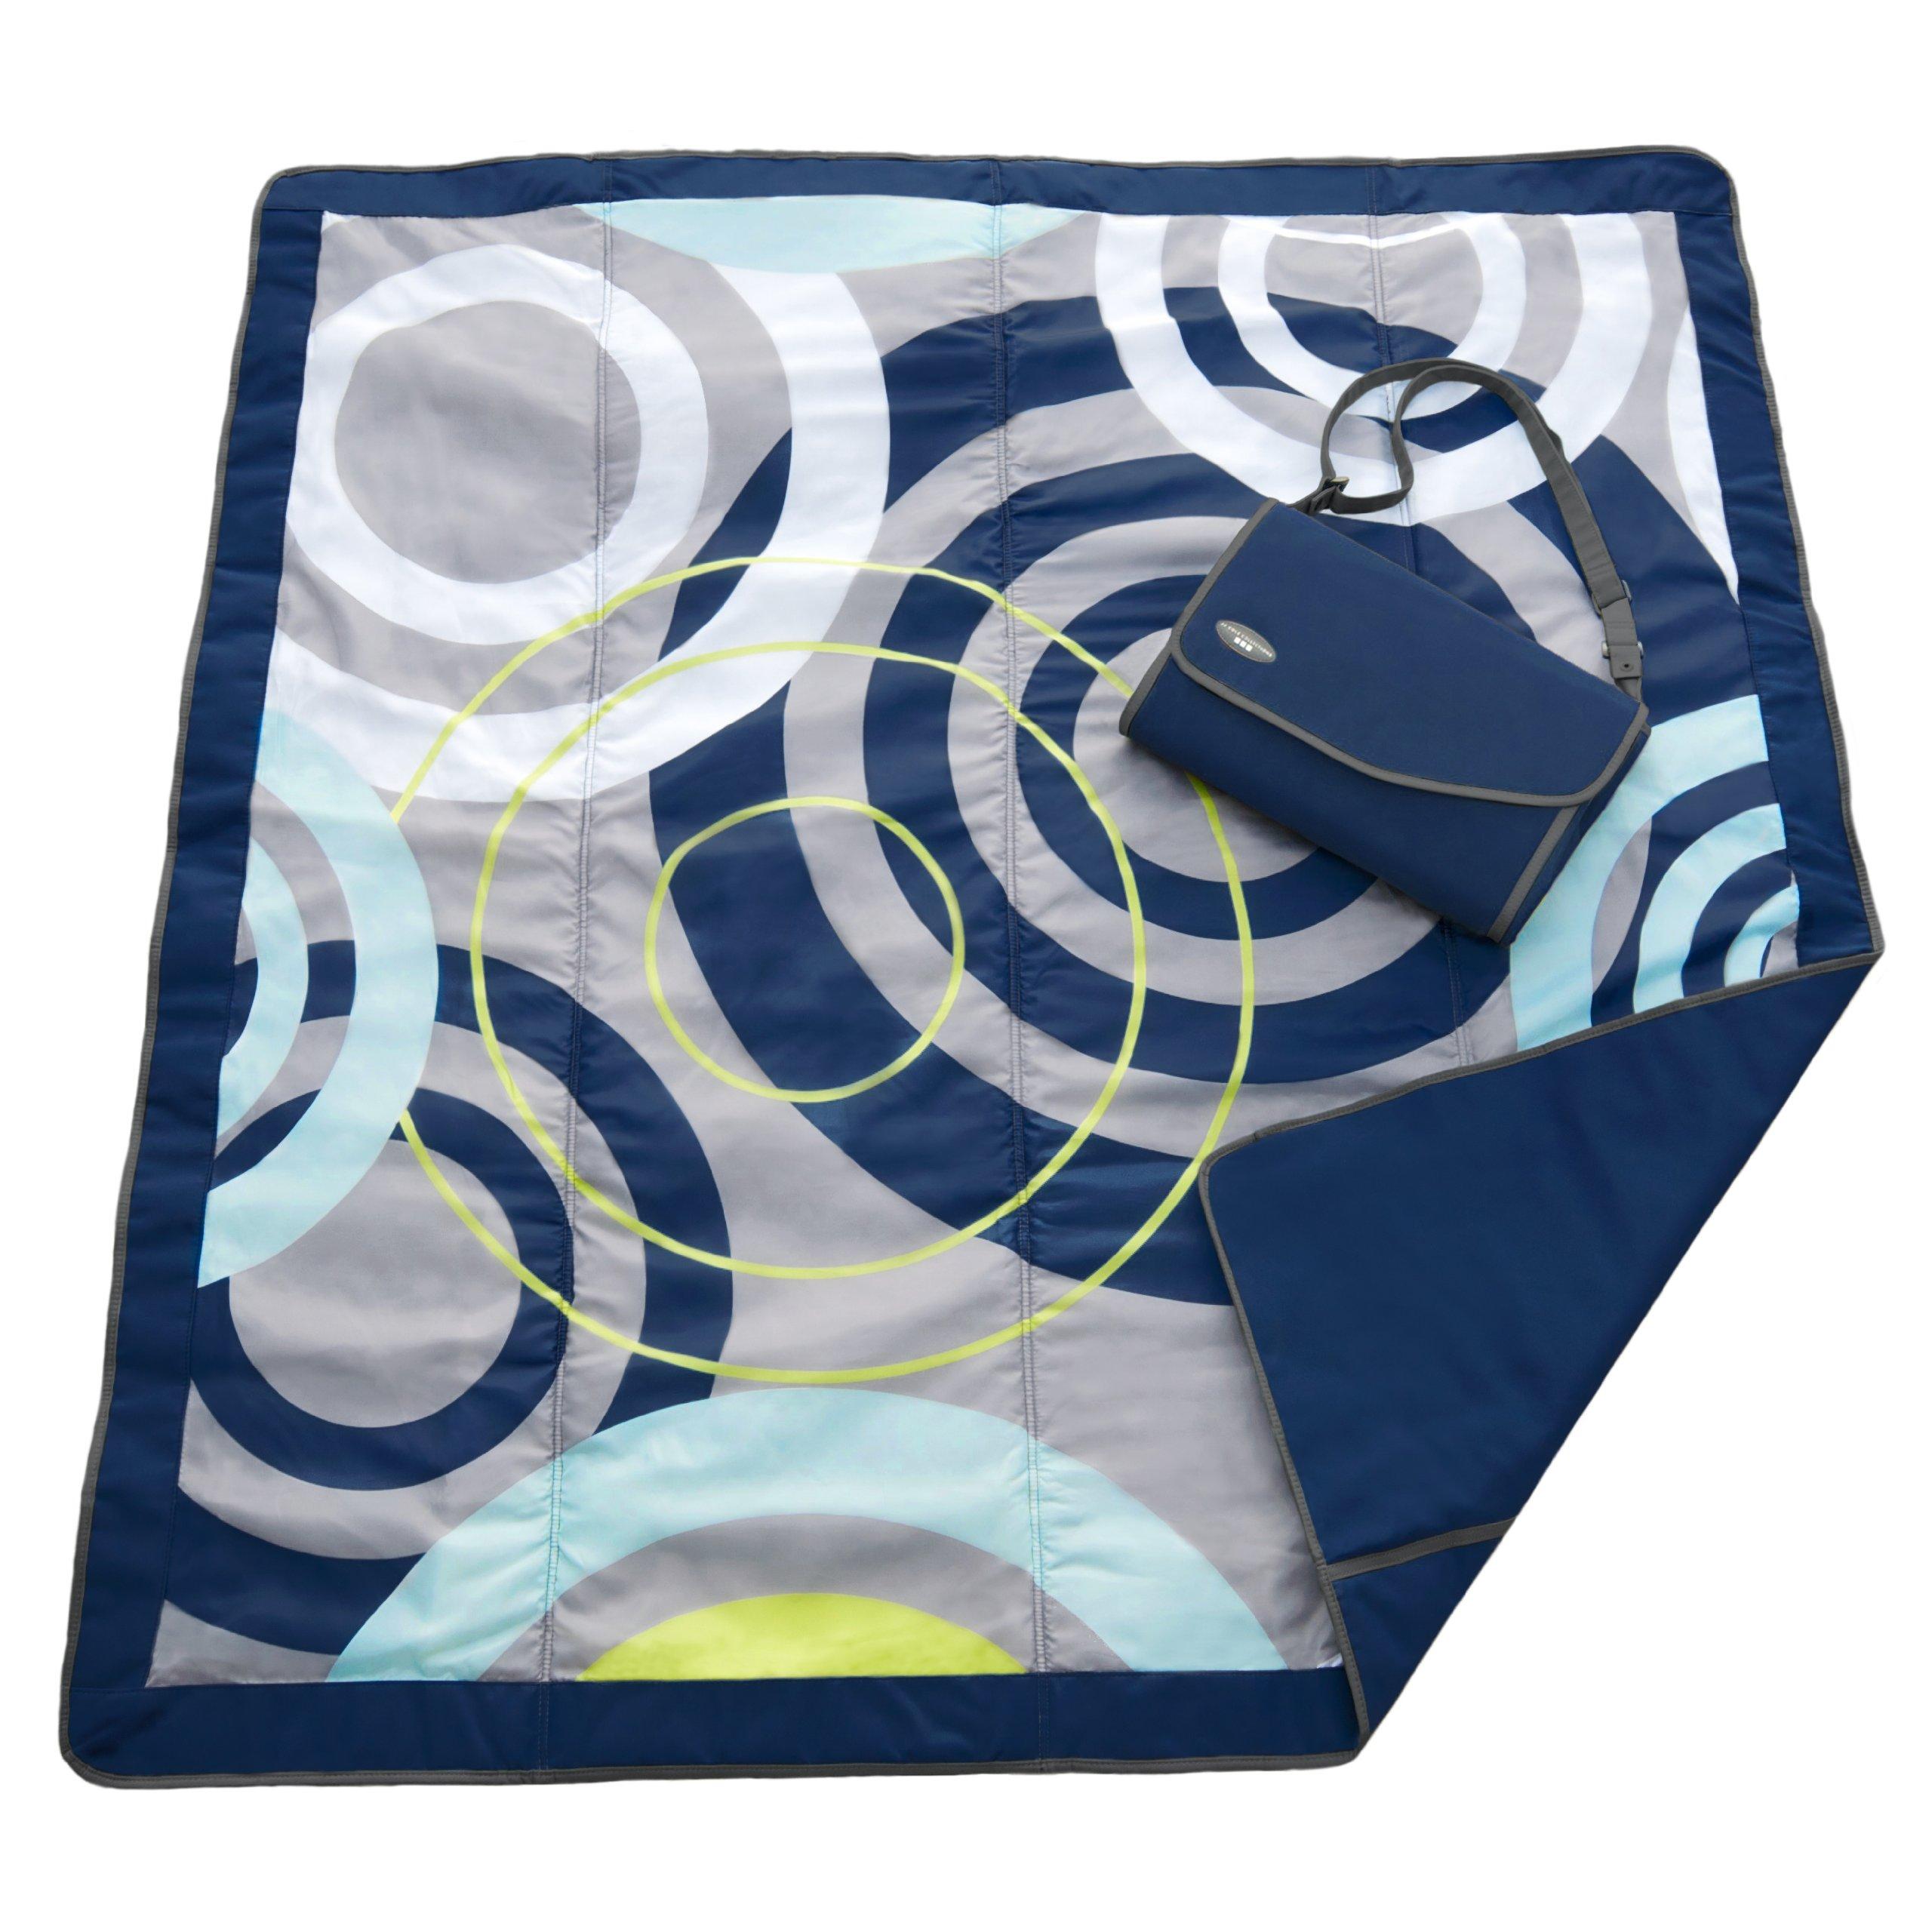 Jj Cole Outdoor Blanket, 7'X'5 Blue Orbit